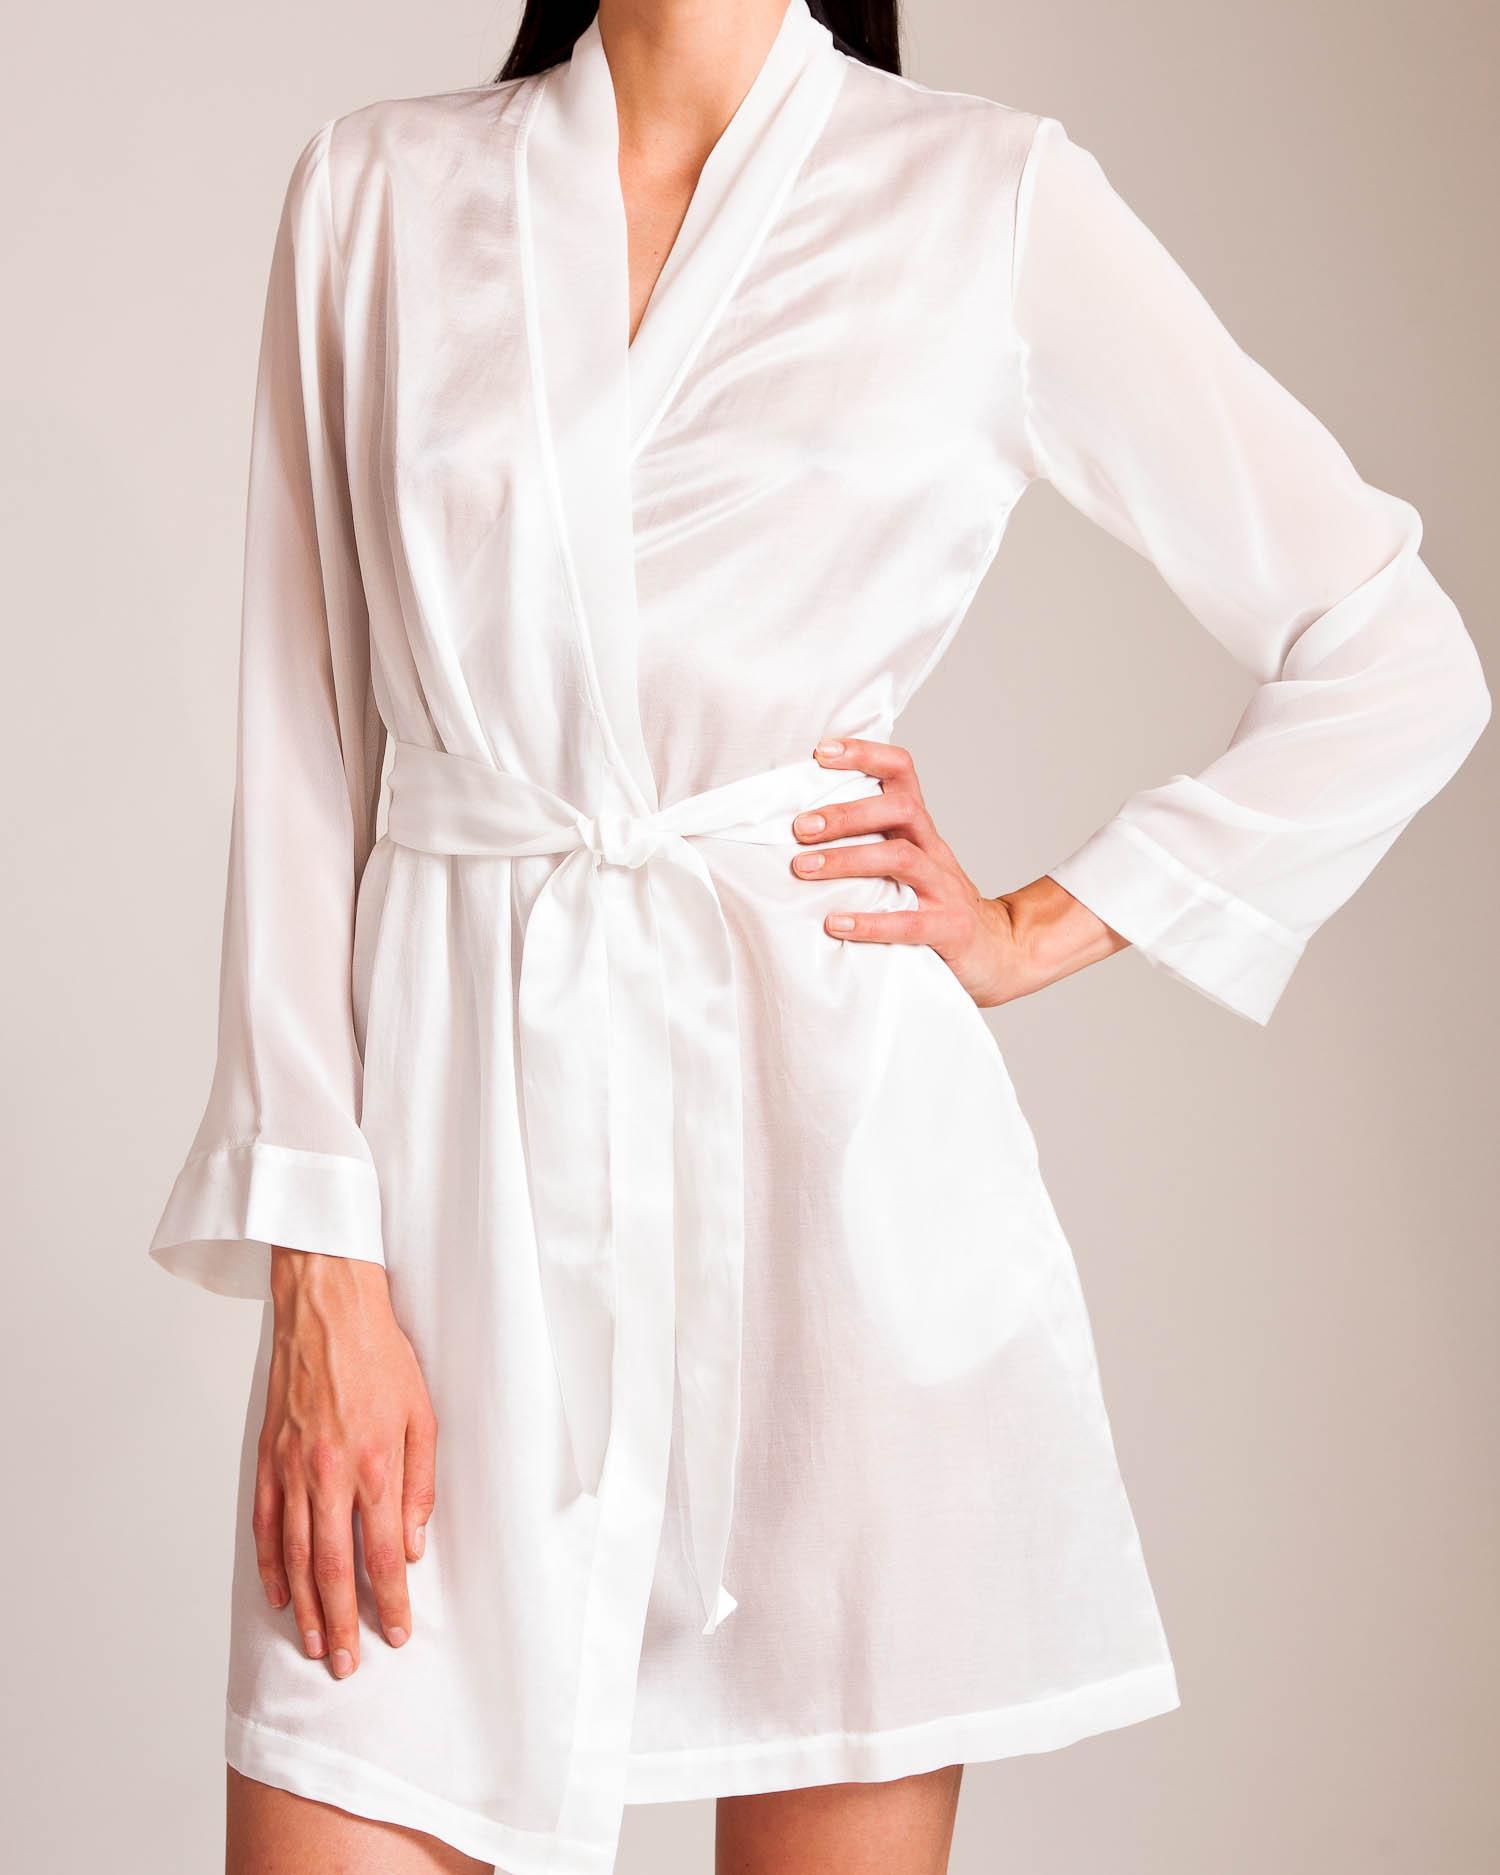 Lyst - La Perla Jazz Time Short Robe in White 9f93593fa